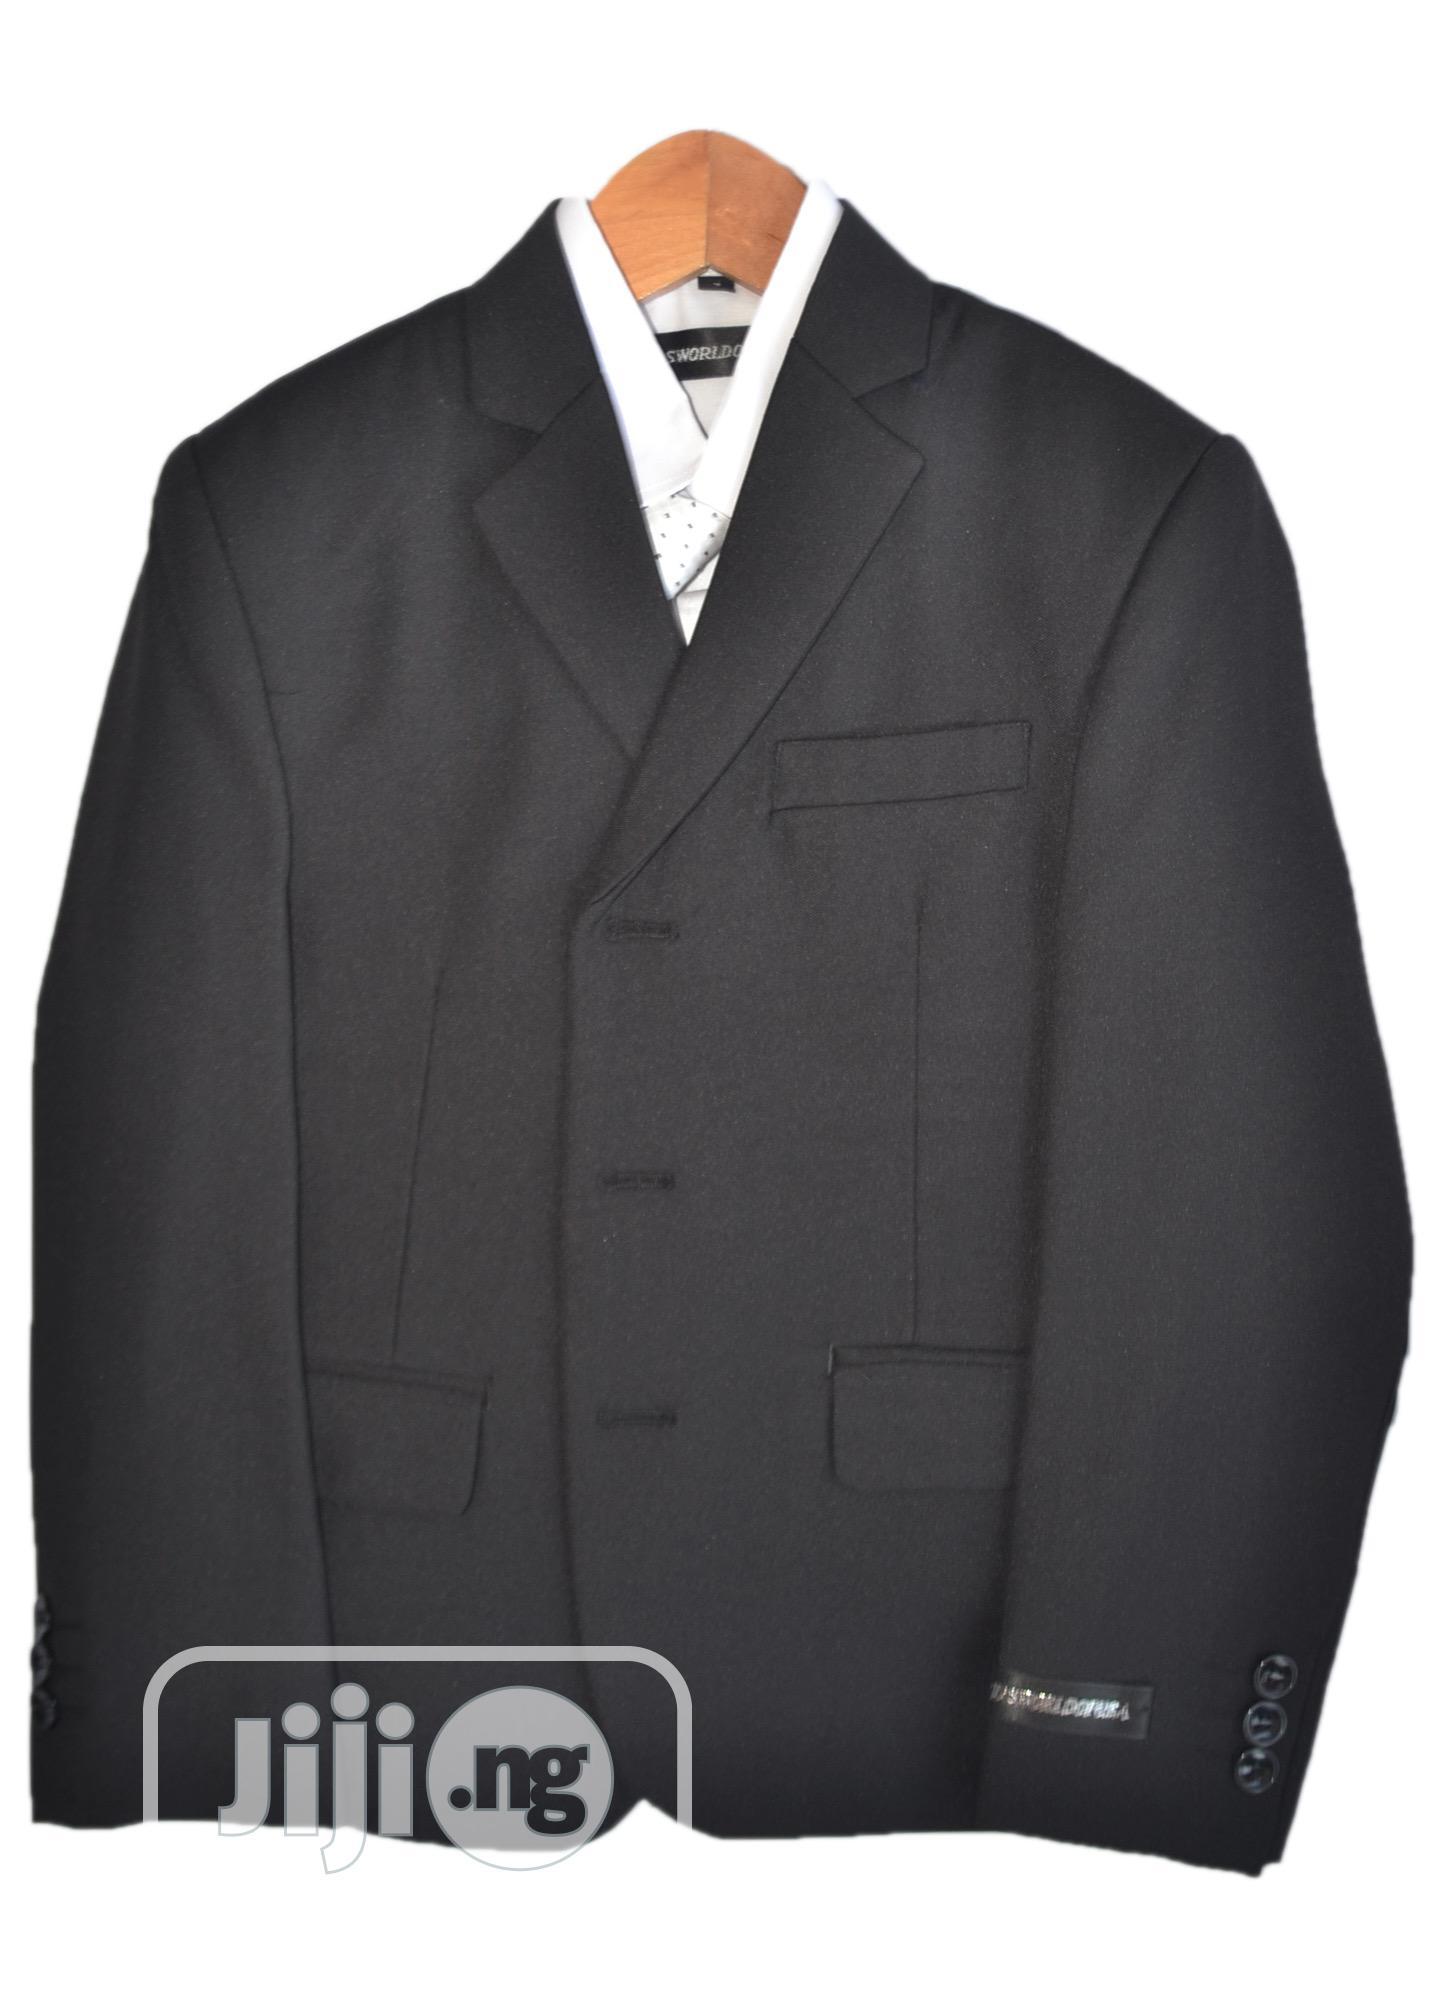 Archive: Suit for Boys